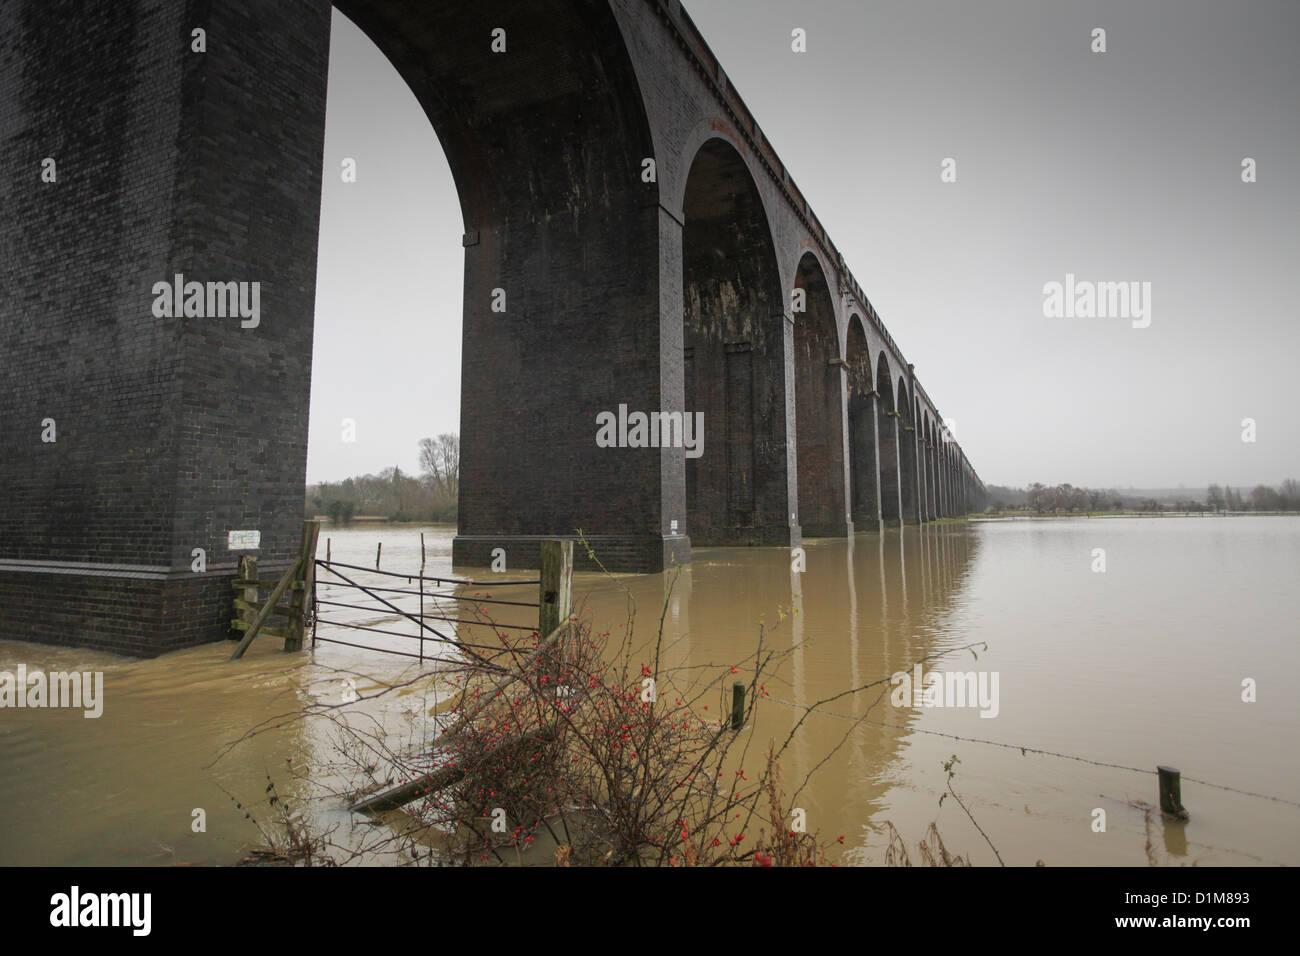 THE FLOODING AT HARRINGWORTH VIADUCT,NORTHANTS, - Stock Image